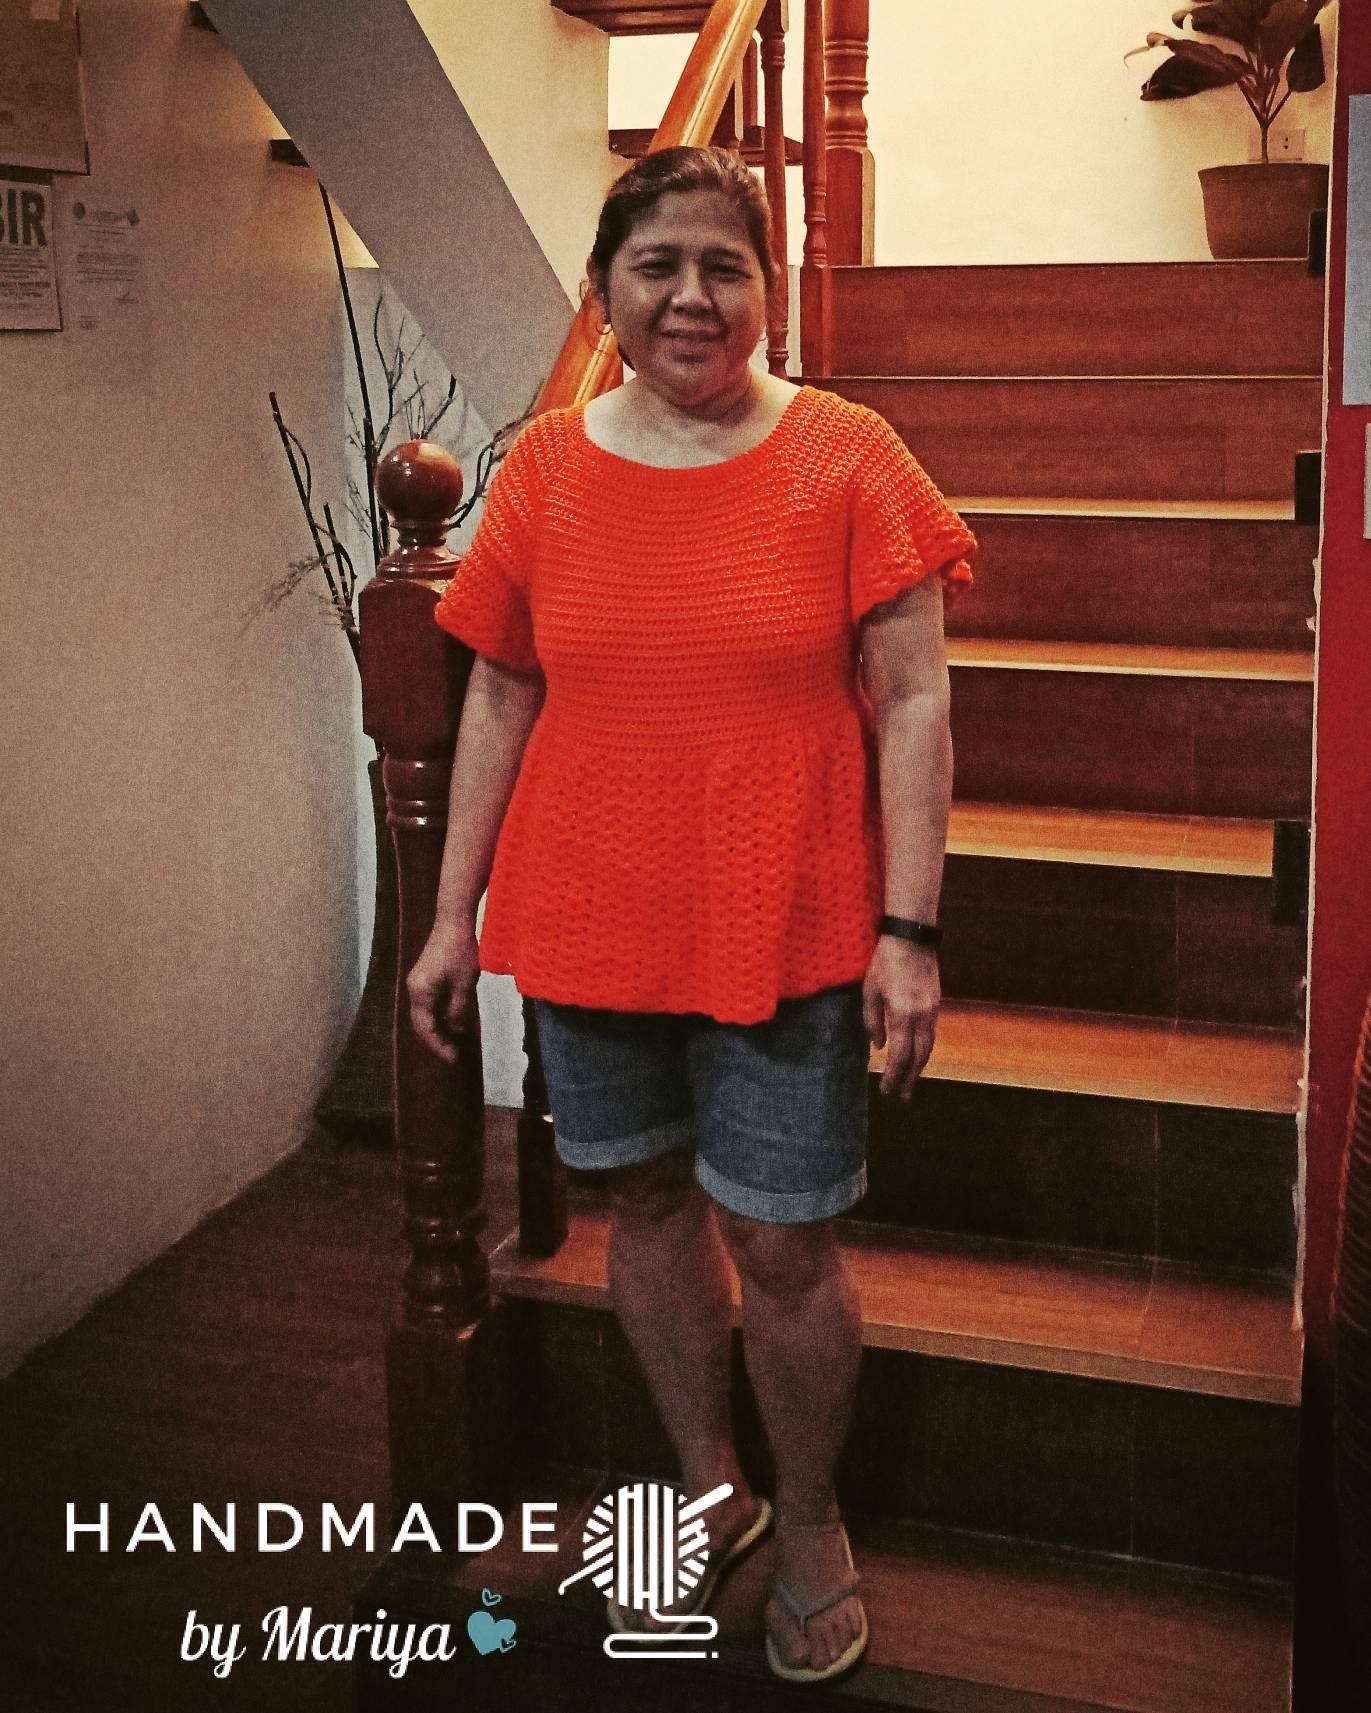 HandmadebyMariyaph added a photo of their purchase